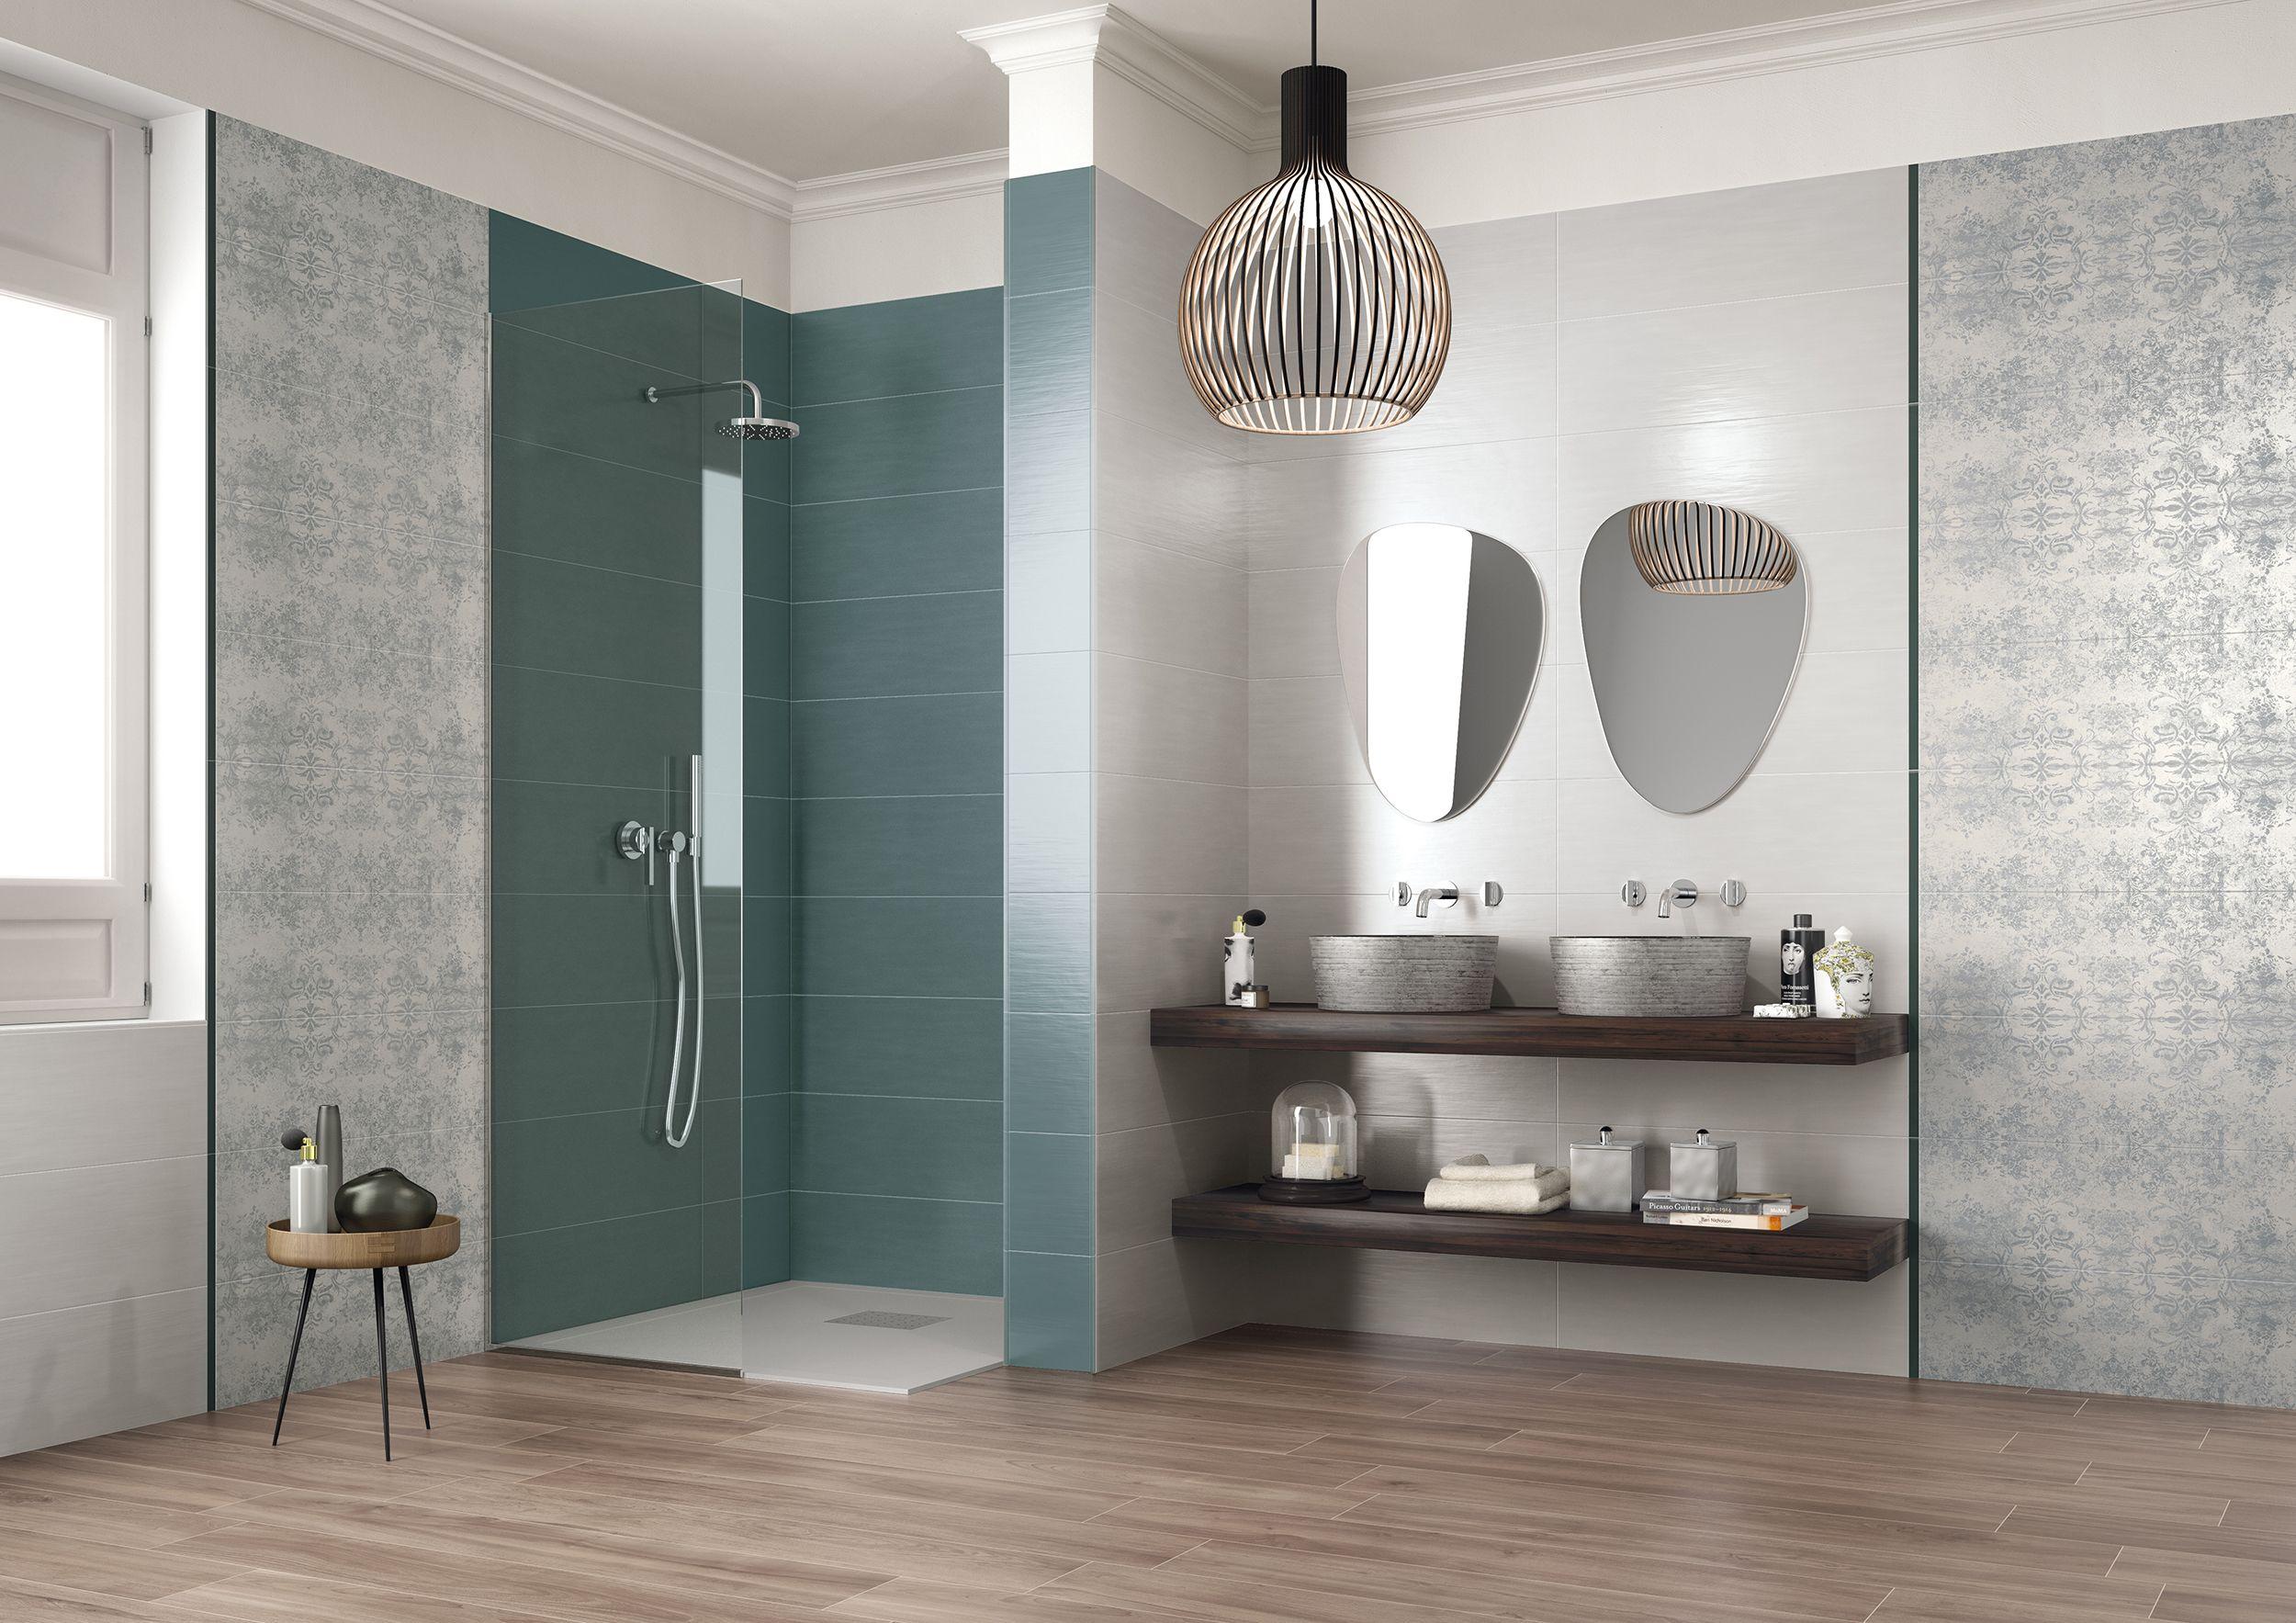 Pin by Joost Goyvaerts on Badkamer | Pinterest | Bathroom, Home and ...